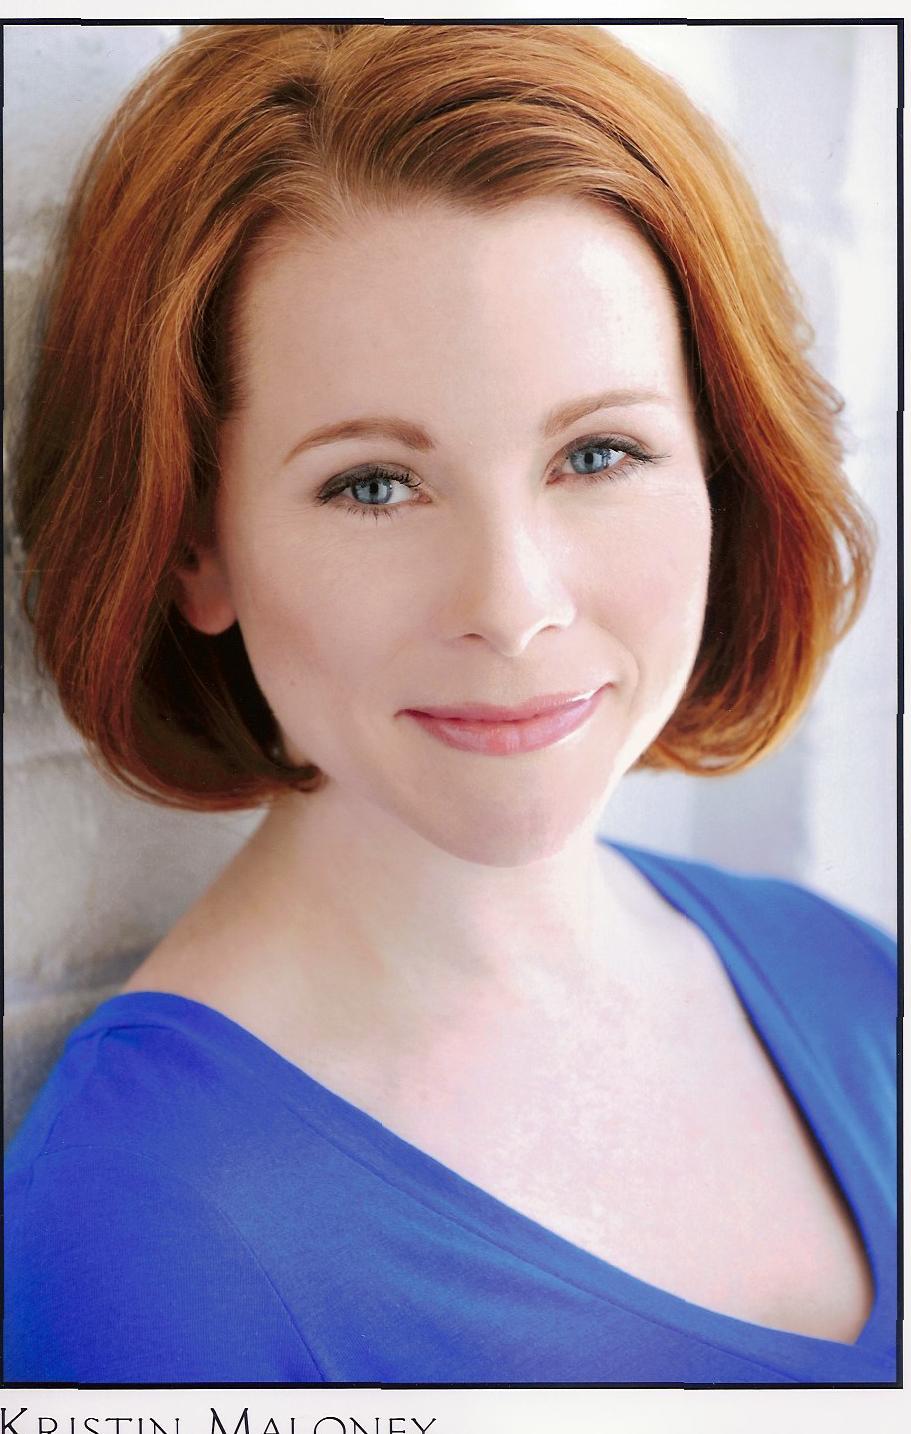 Kristin Maloney Headshot1.jpg